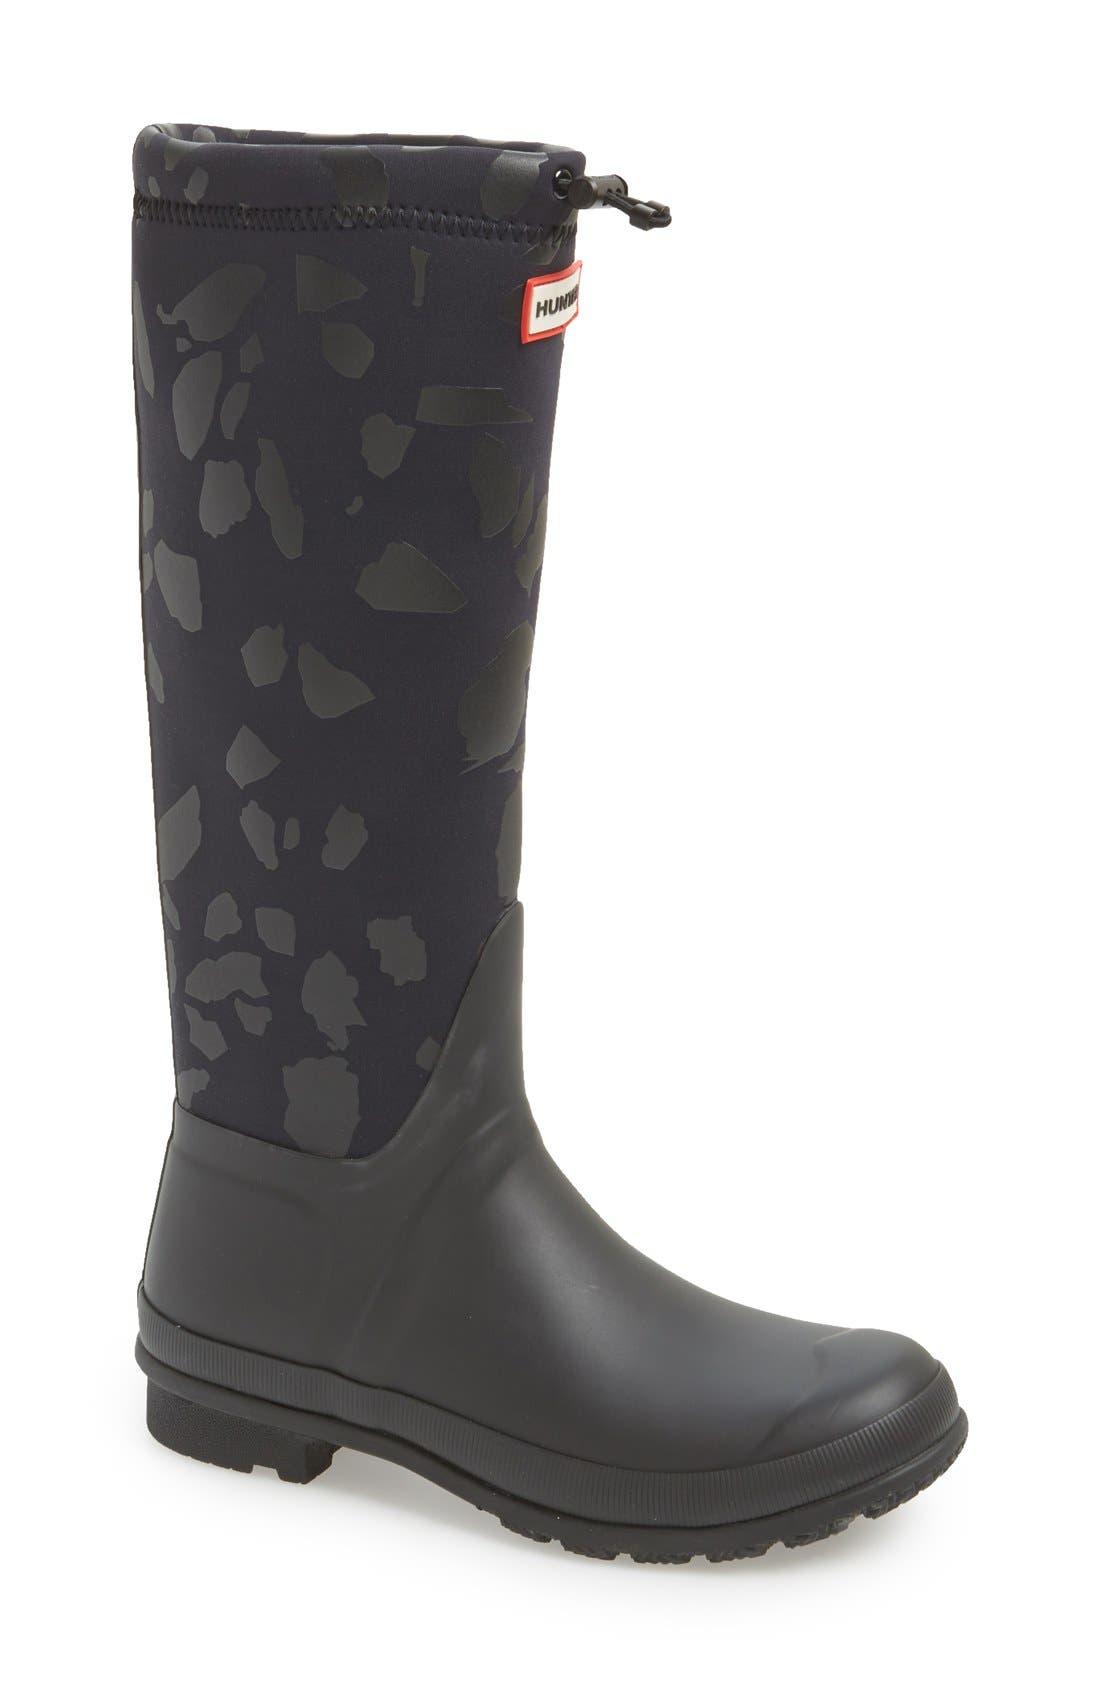 HUNTER 'Original TeazzoTour' WaterproofRain Boot, Main, color, 019